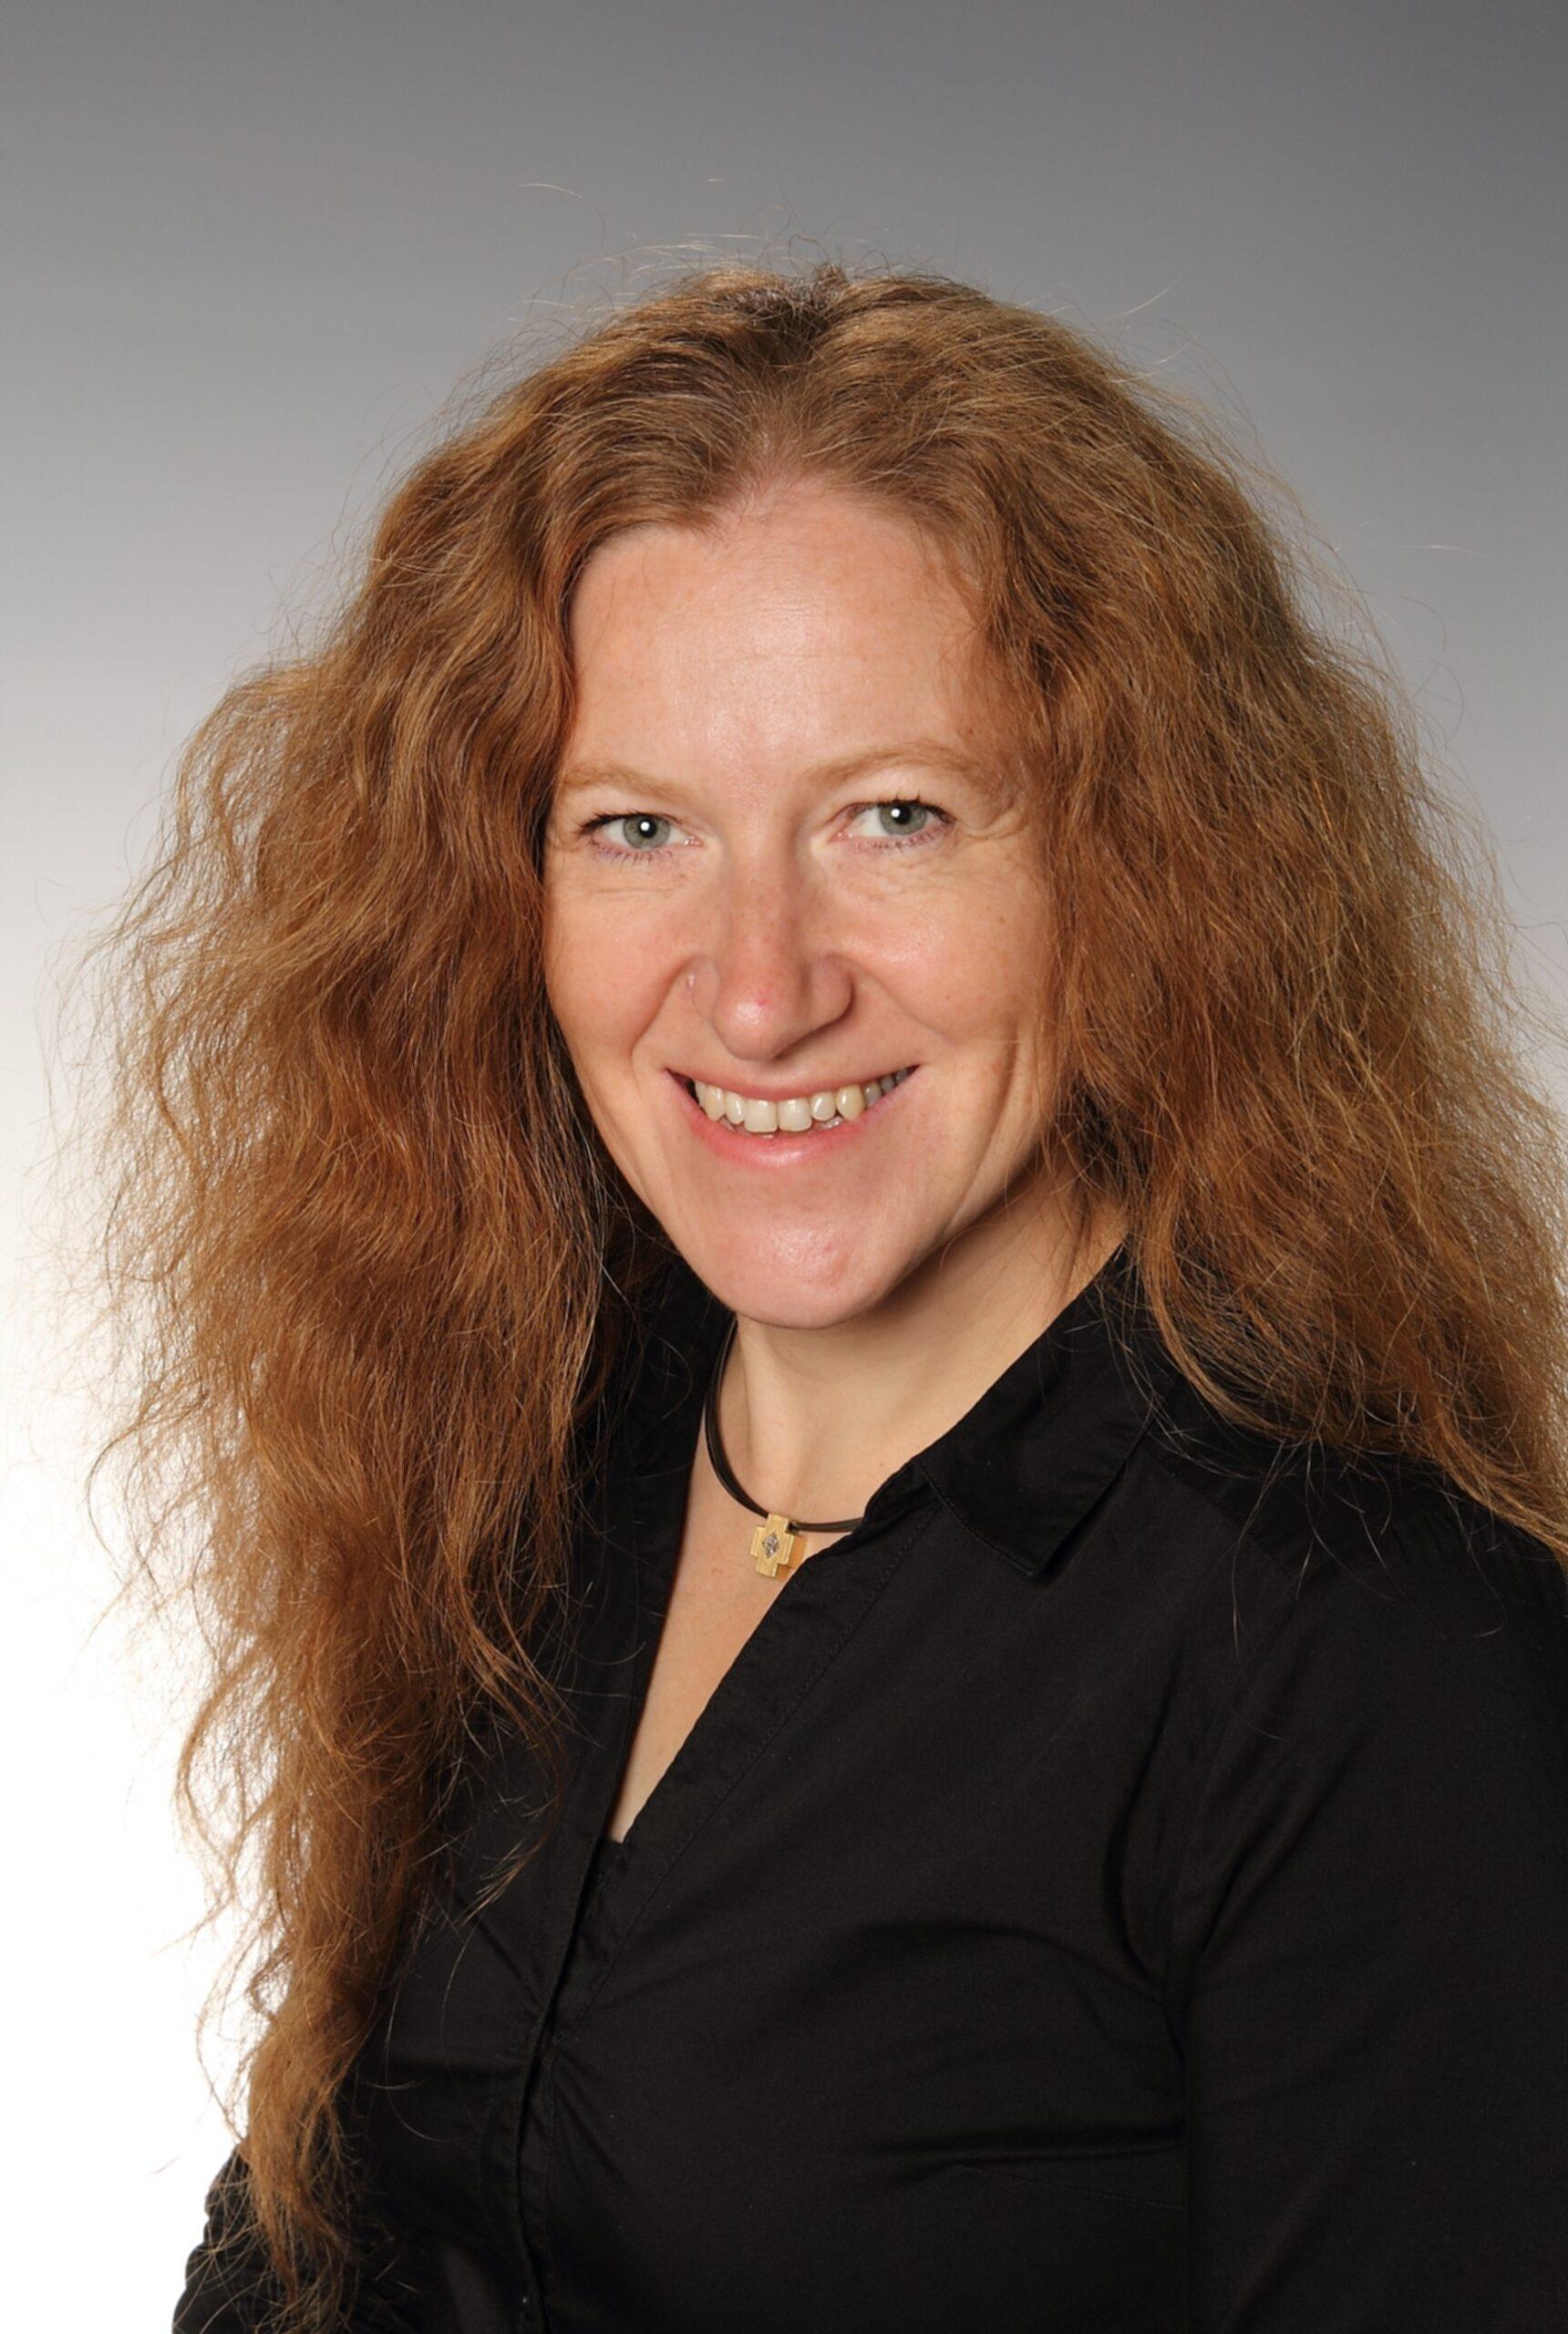 Pauline Thanhofer